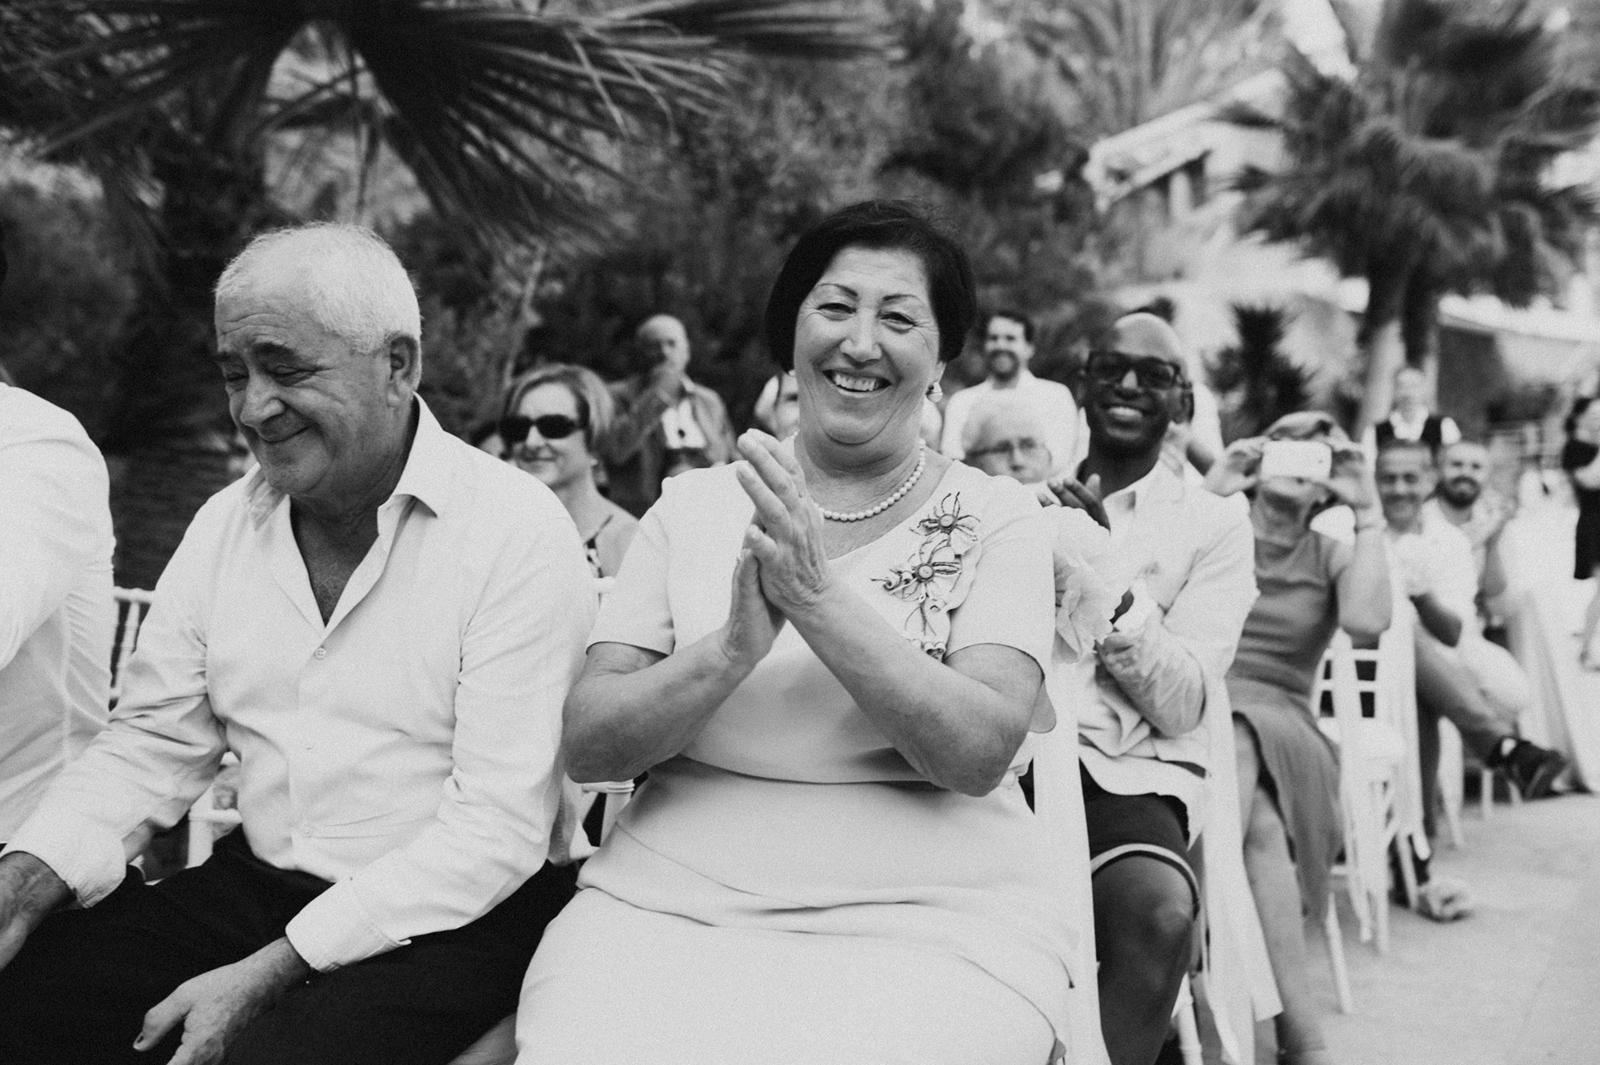 Hochzeitsfotograf_Ibiza_143.jpg